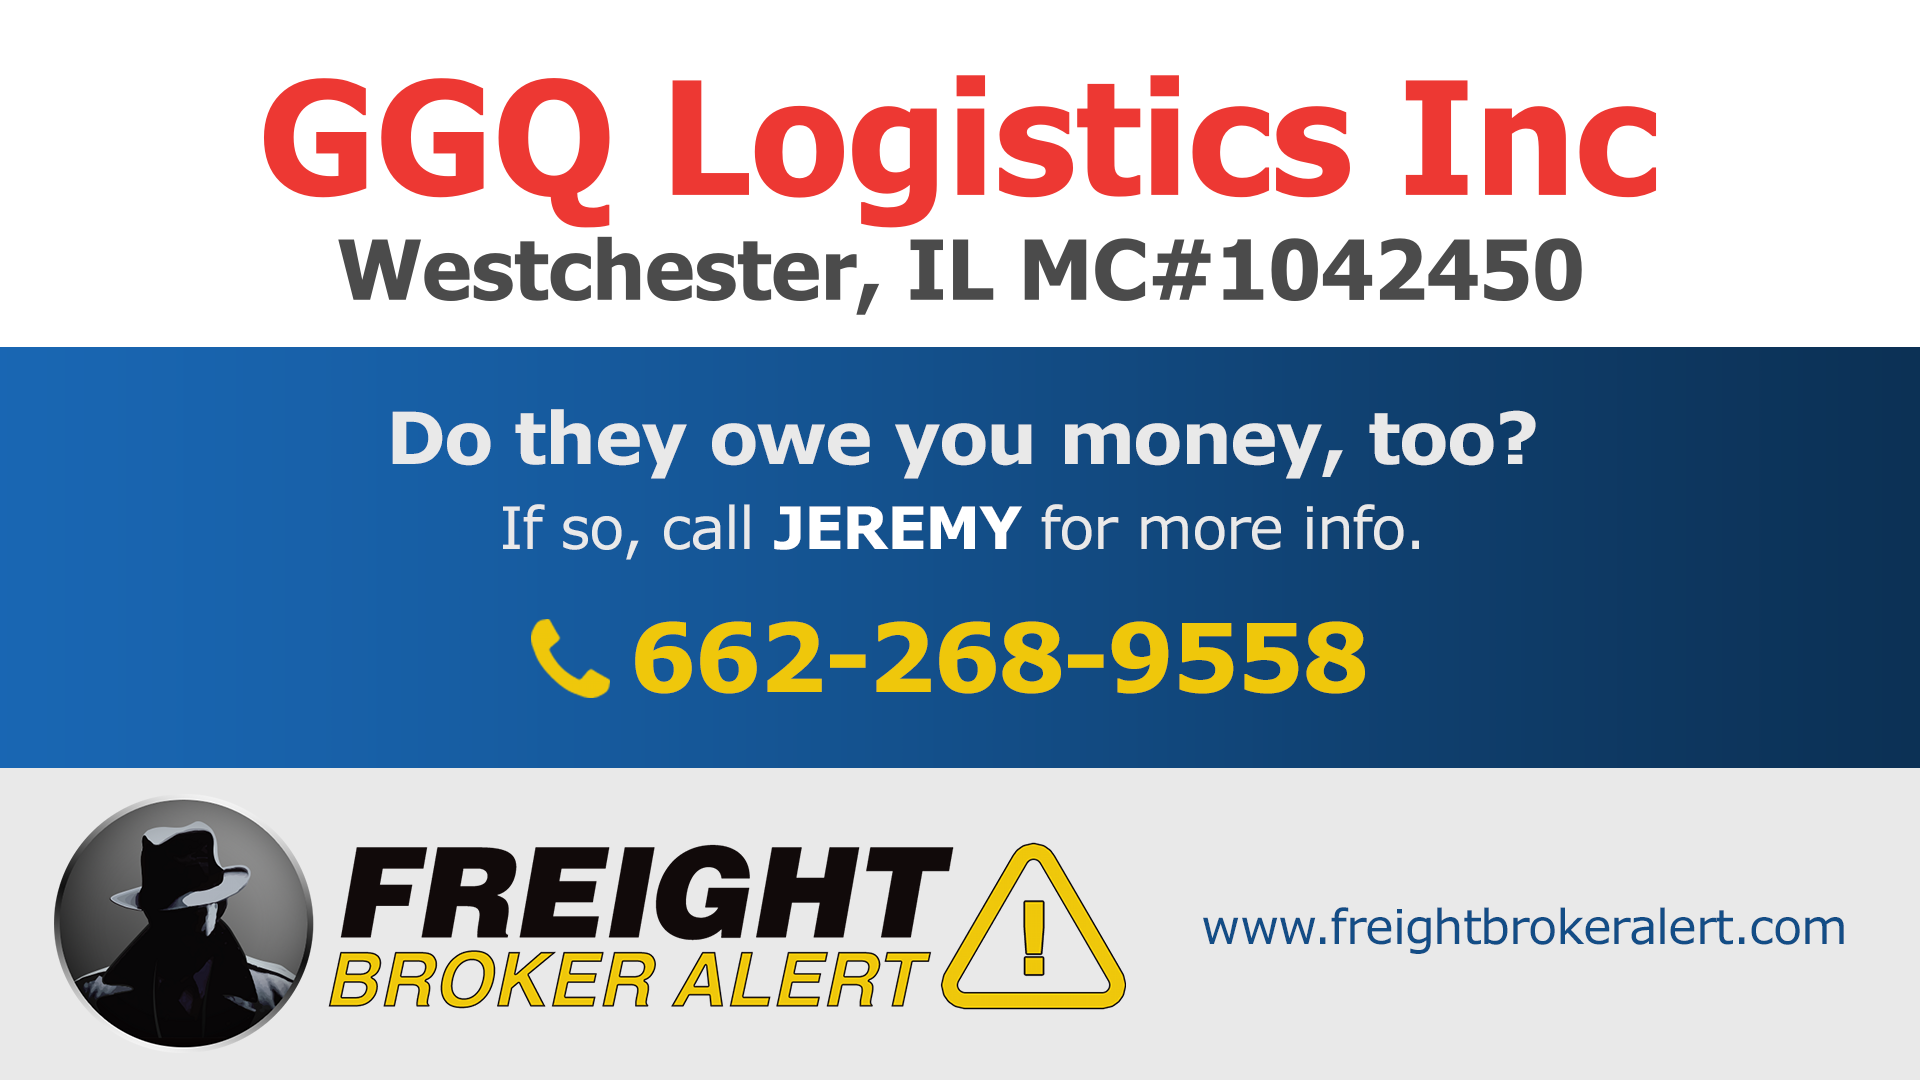 GGQ Logistics Inc Illinois